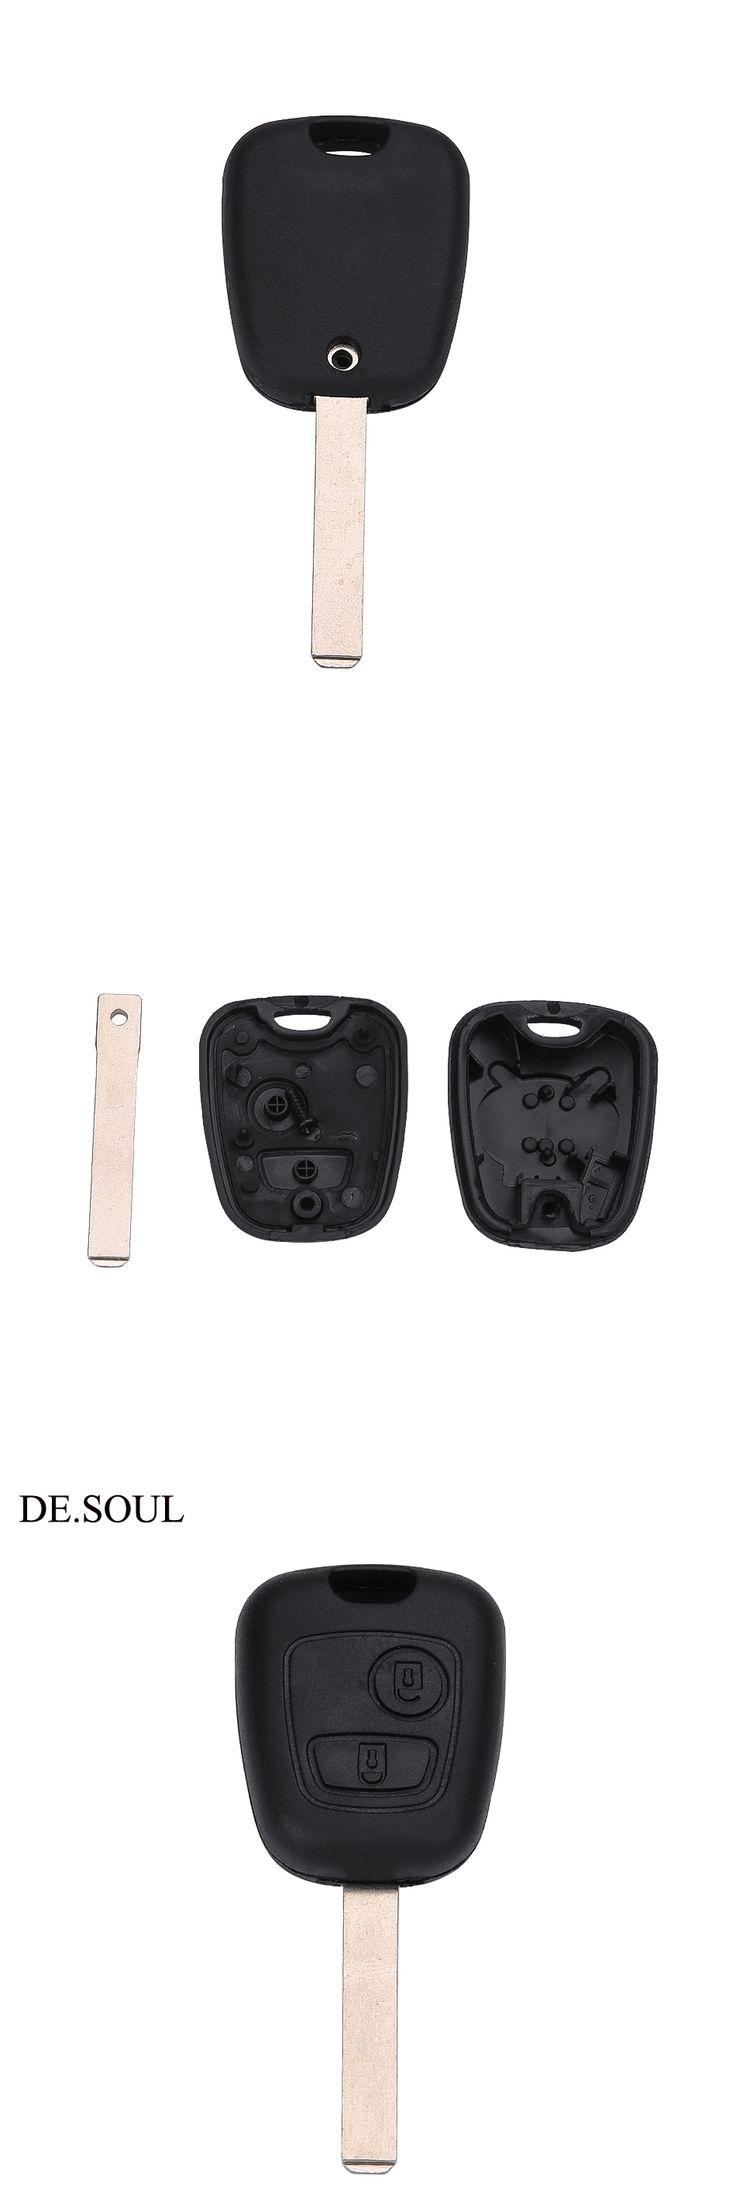 DE.SOUL 2Button Remote Car Key Case For Citroen C1 C2 C3 / Pluriel C4 C5 C8 / Xsara Picasso Cover Key Shell Blank with Screw